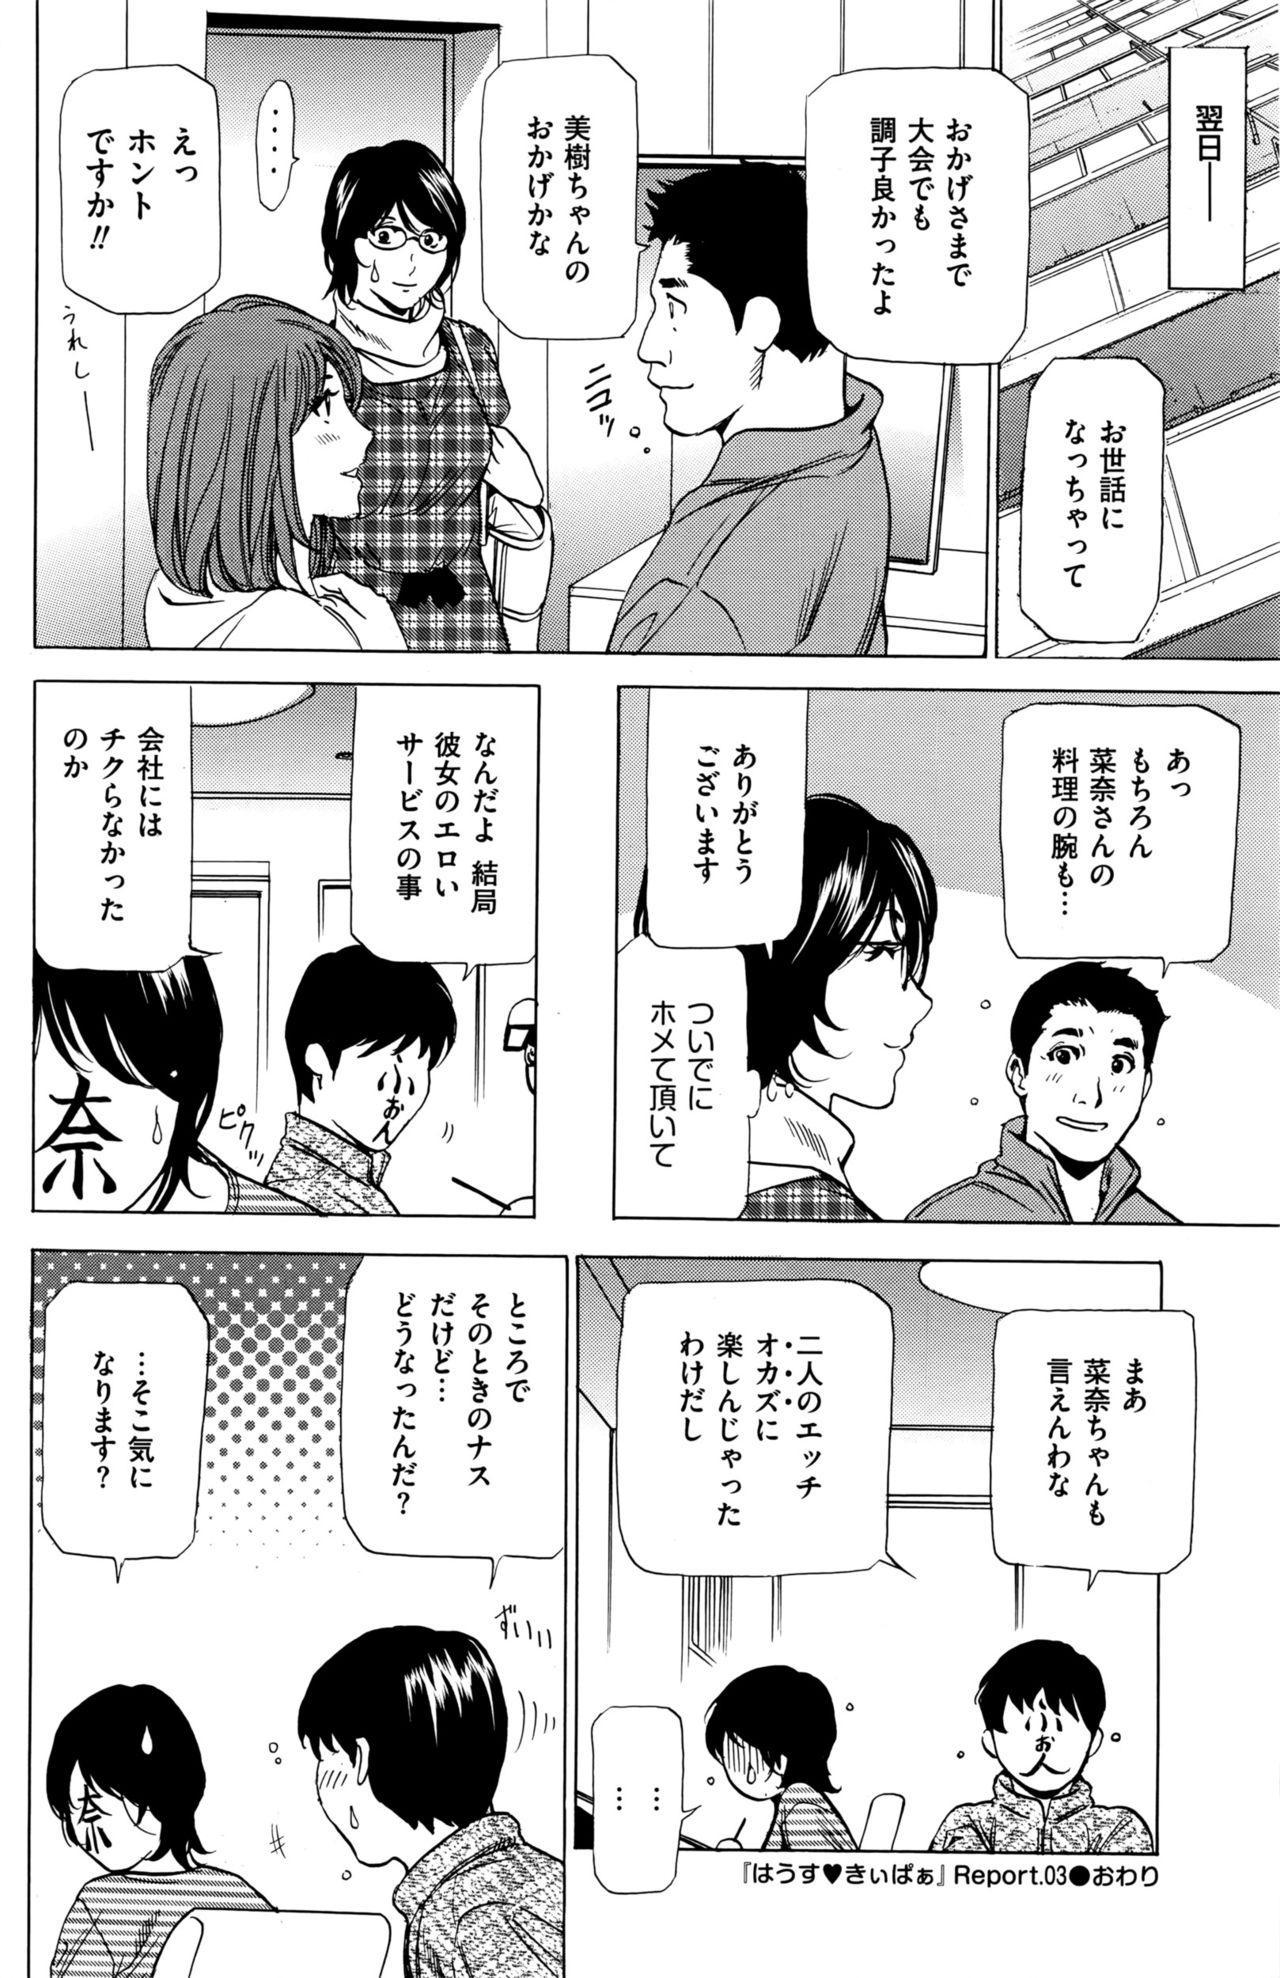 Wa Usuki Ipa a 1-10 54